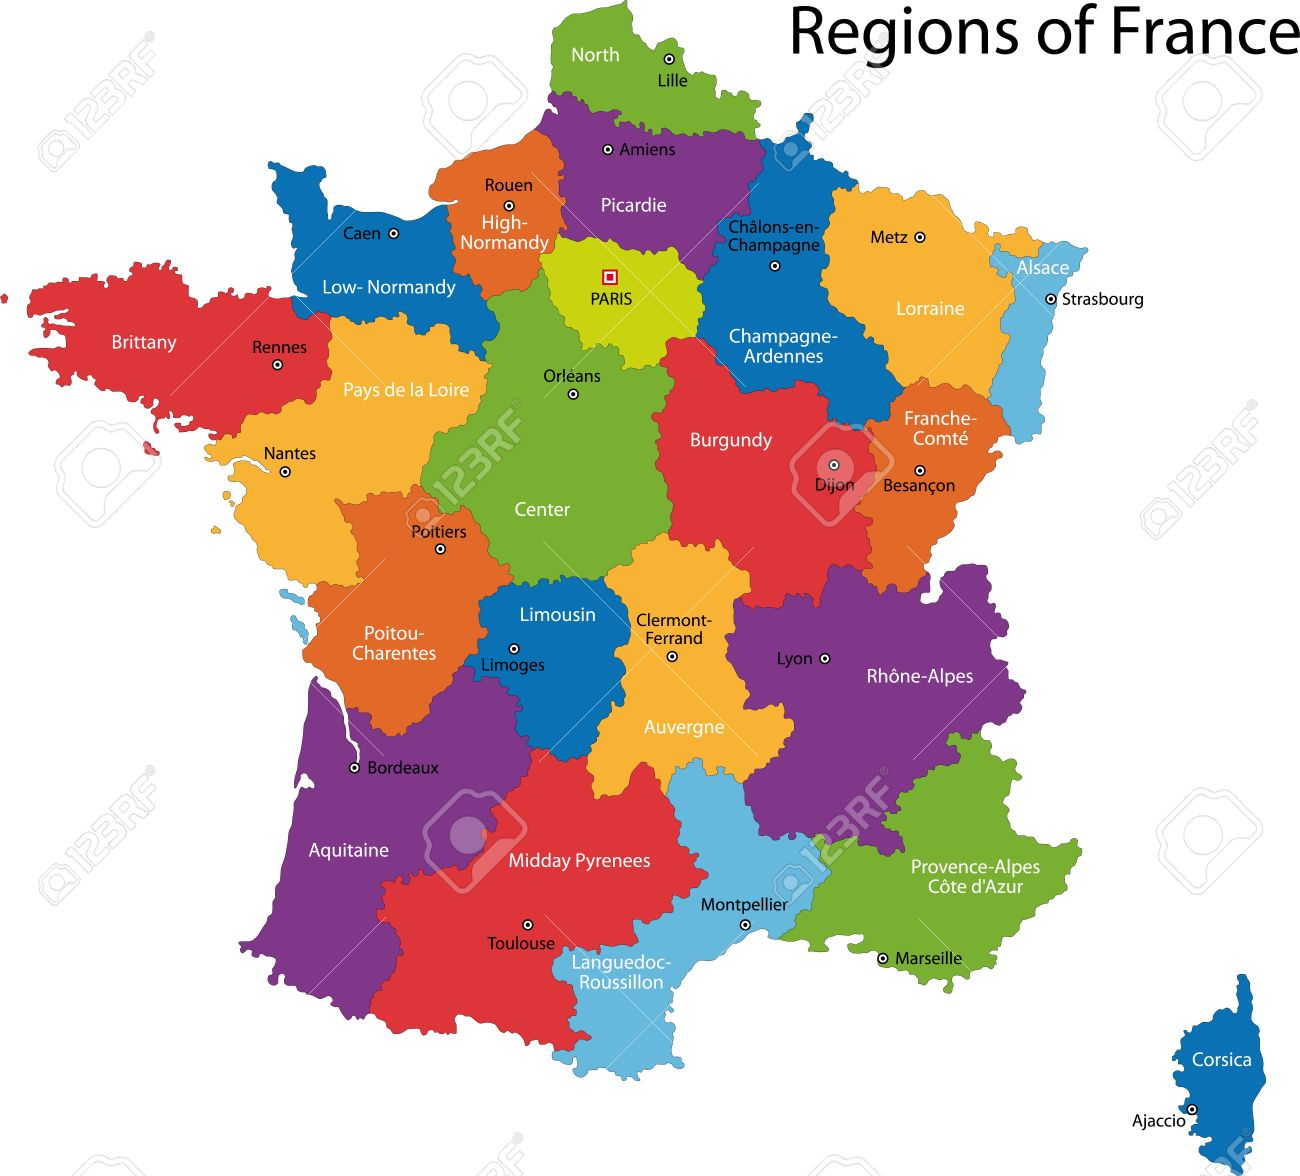 carte de france villes principales et regions Carte Colorée France Avec Les Régions Et Les Principales Villes